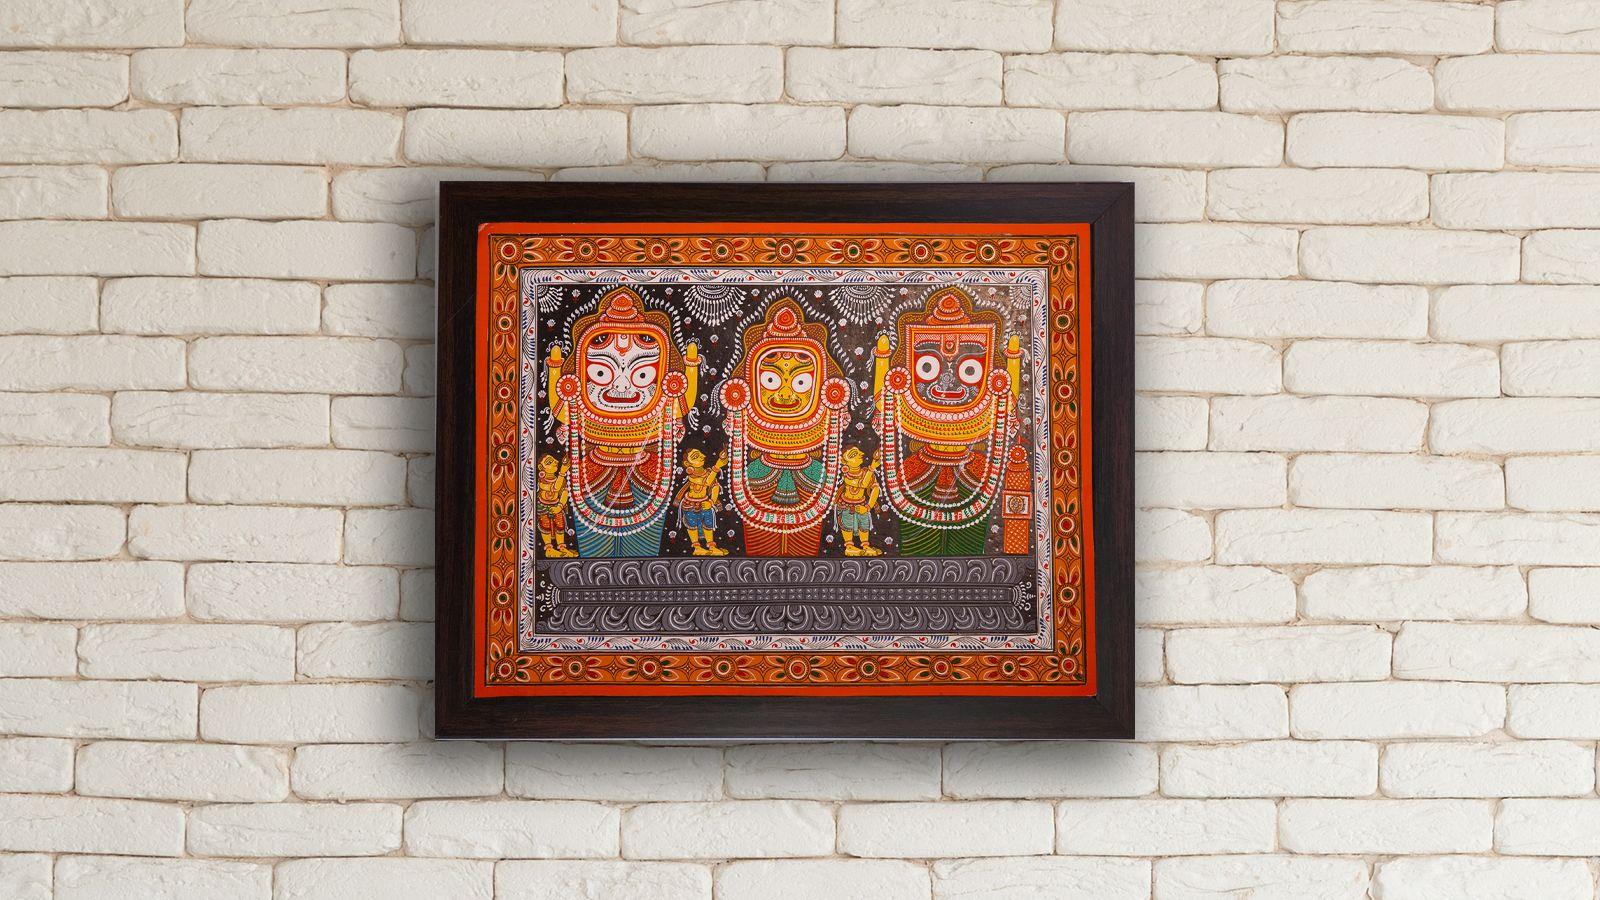 Pattachitra paintings of Lord Jagannath, Balabhadra and Subhadra   Peepul Tree